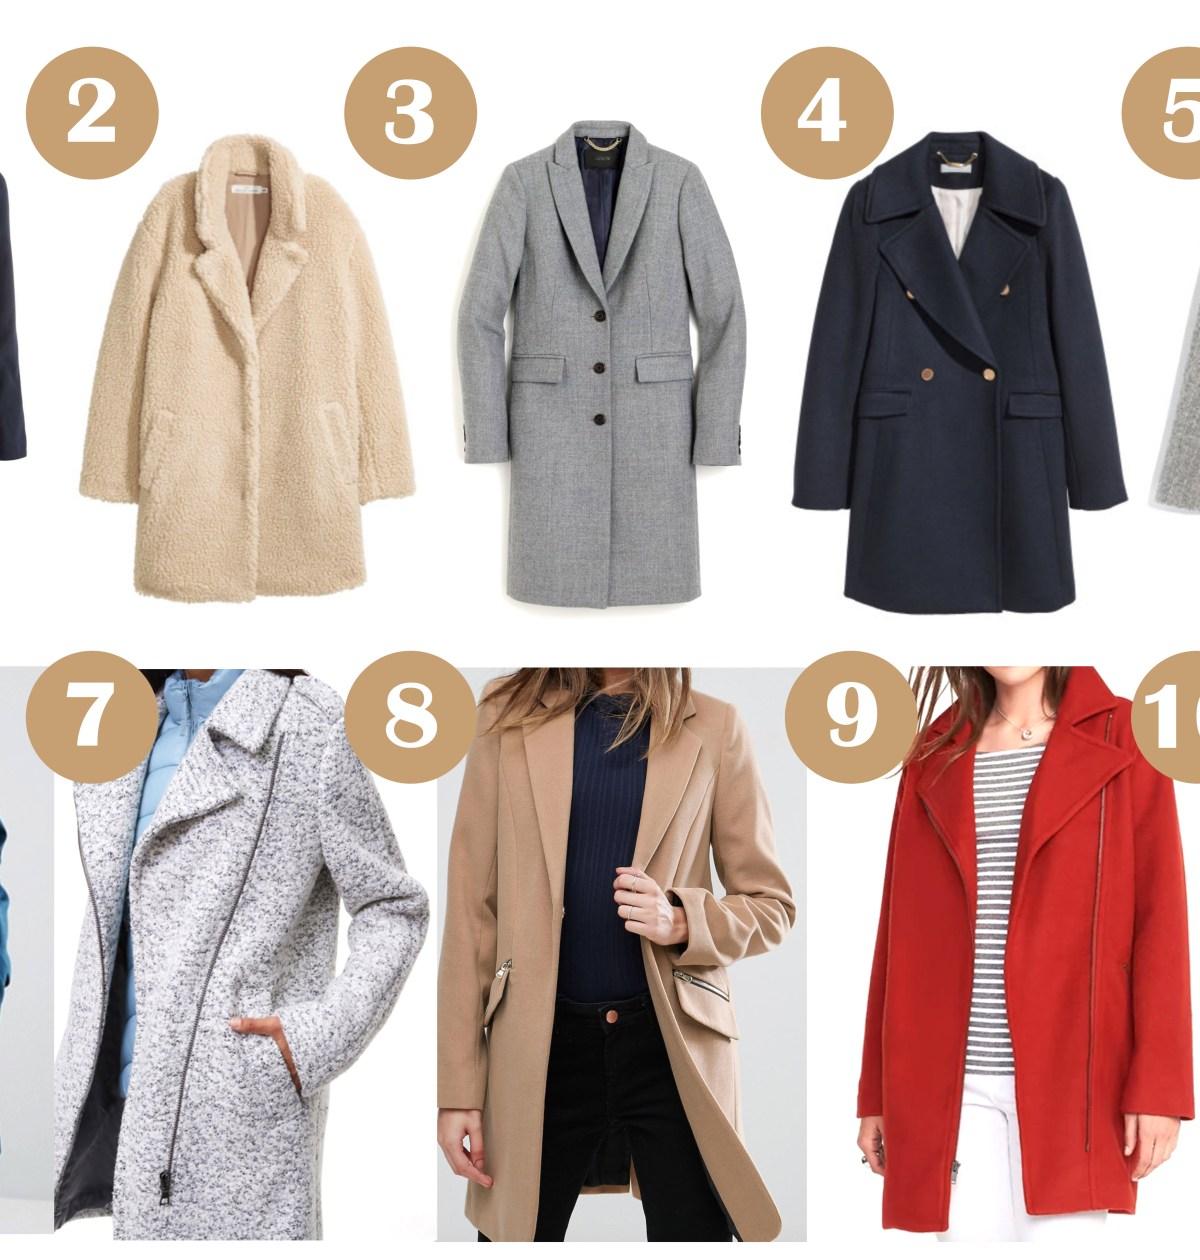 10 Fashionable & Warm Coats For Winter - www.viciloves.com - @viciloves1